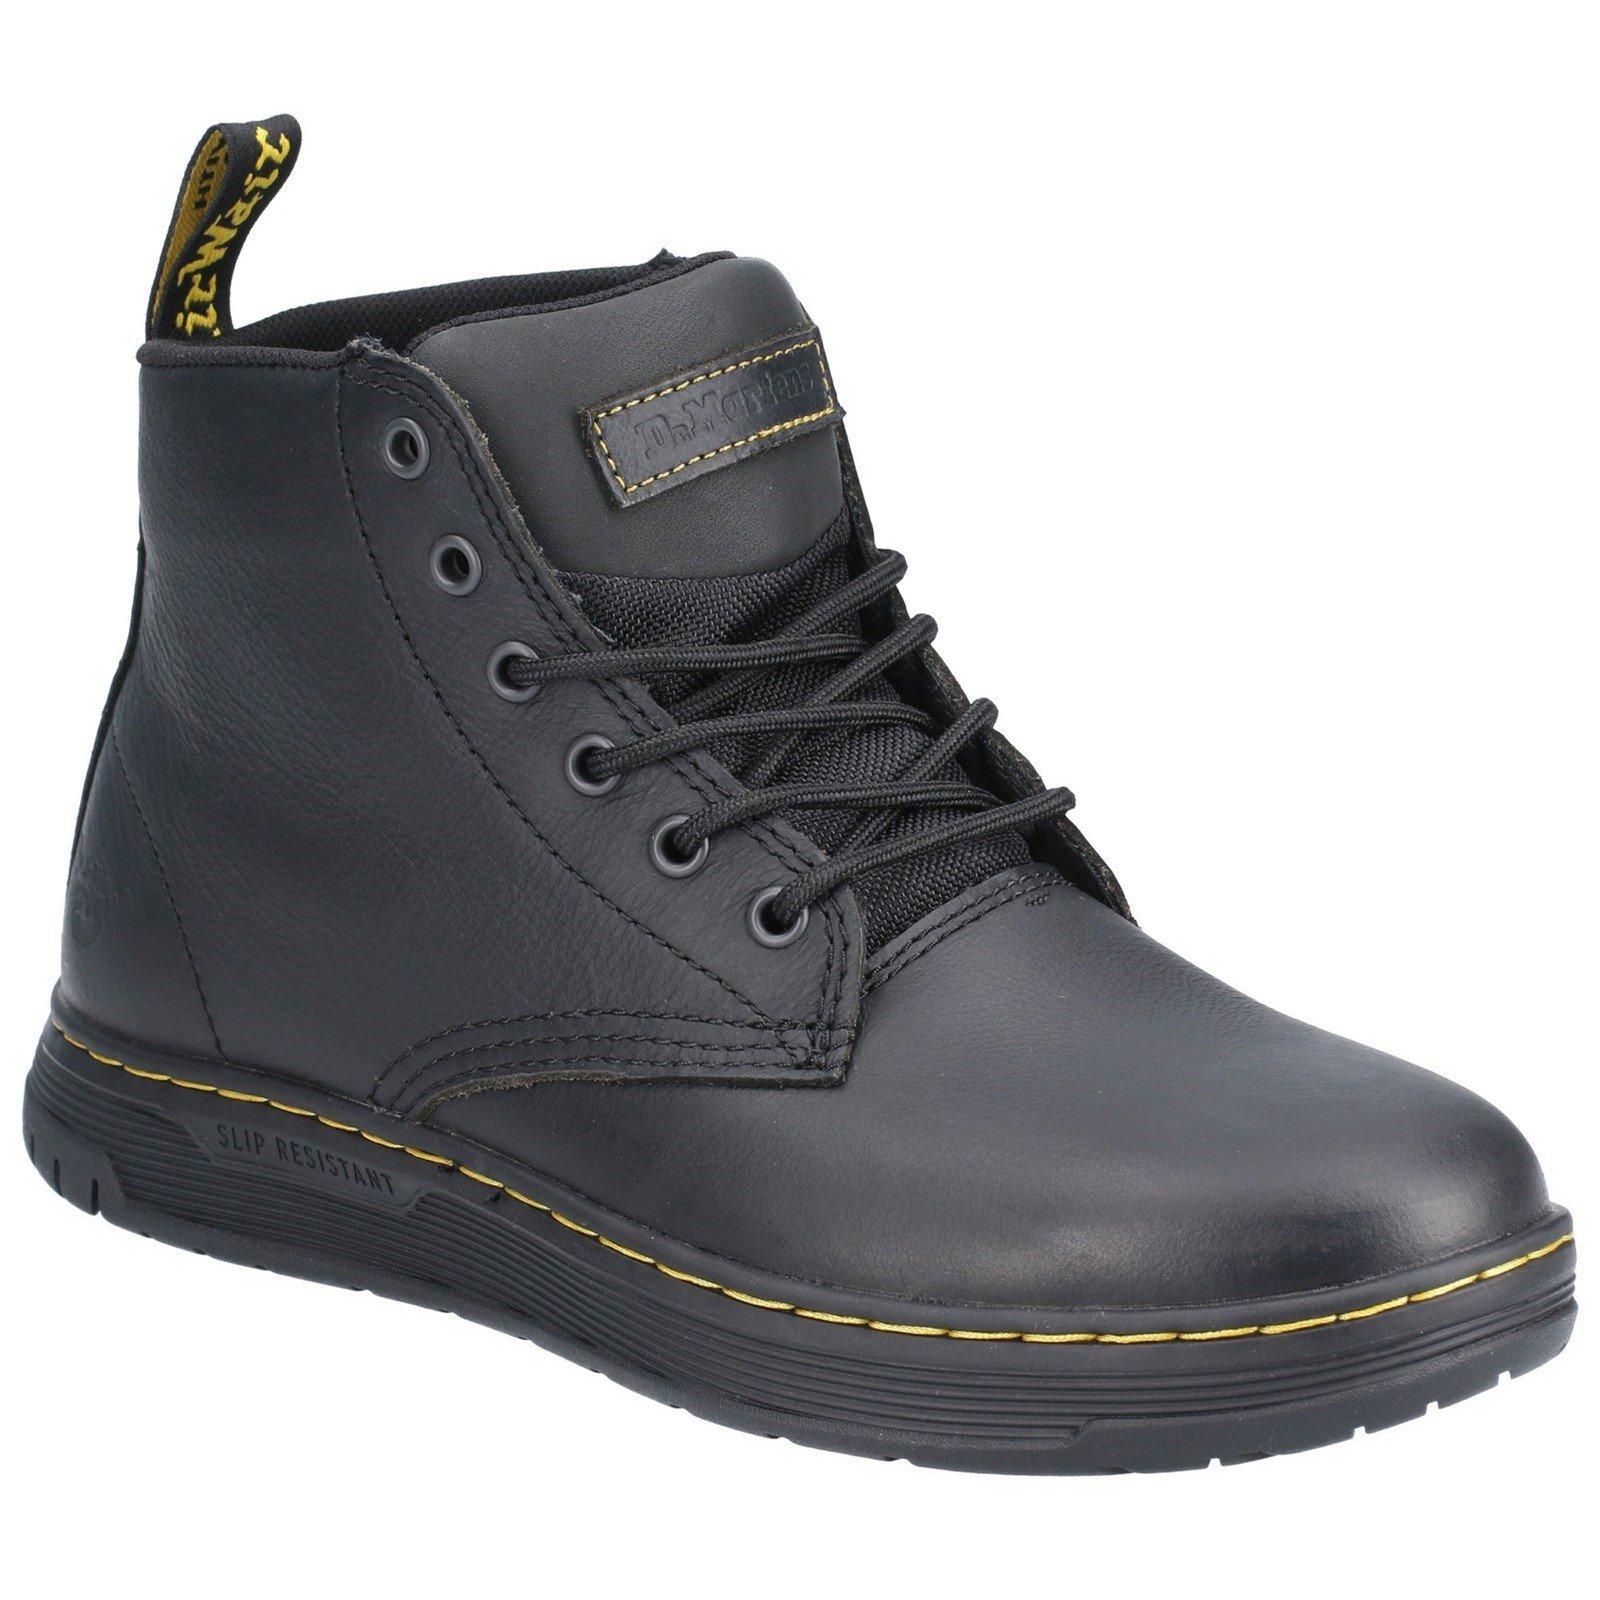 Dr Martens Men's Amwell Slip Resistant Leather Boot Black 29508 - Black 8